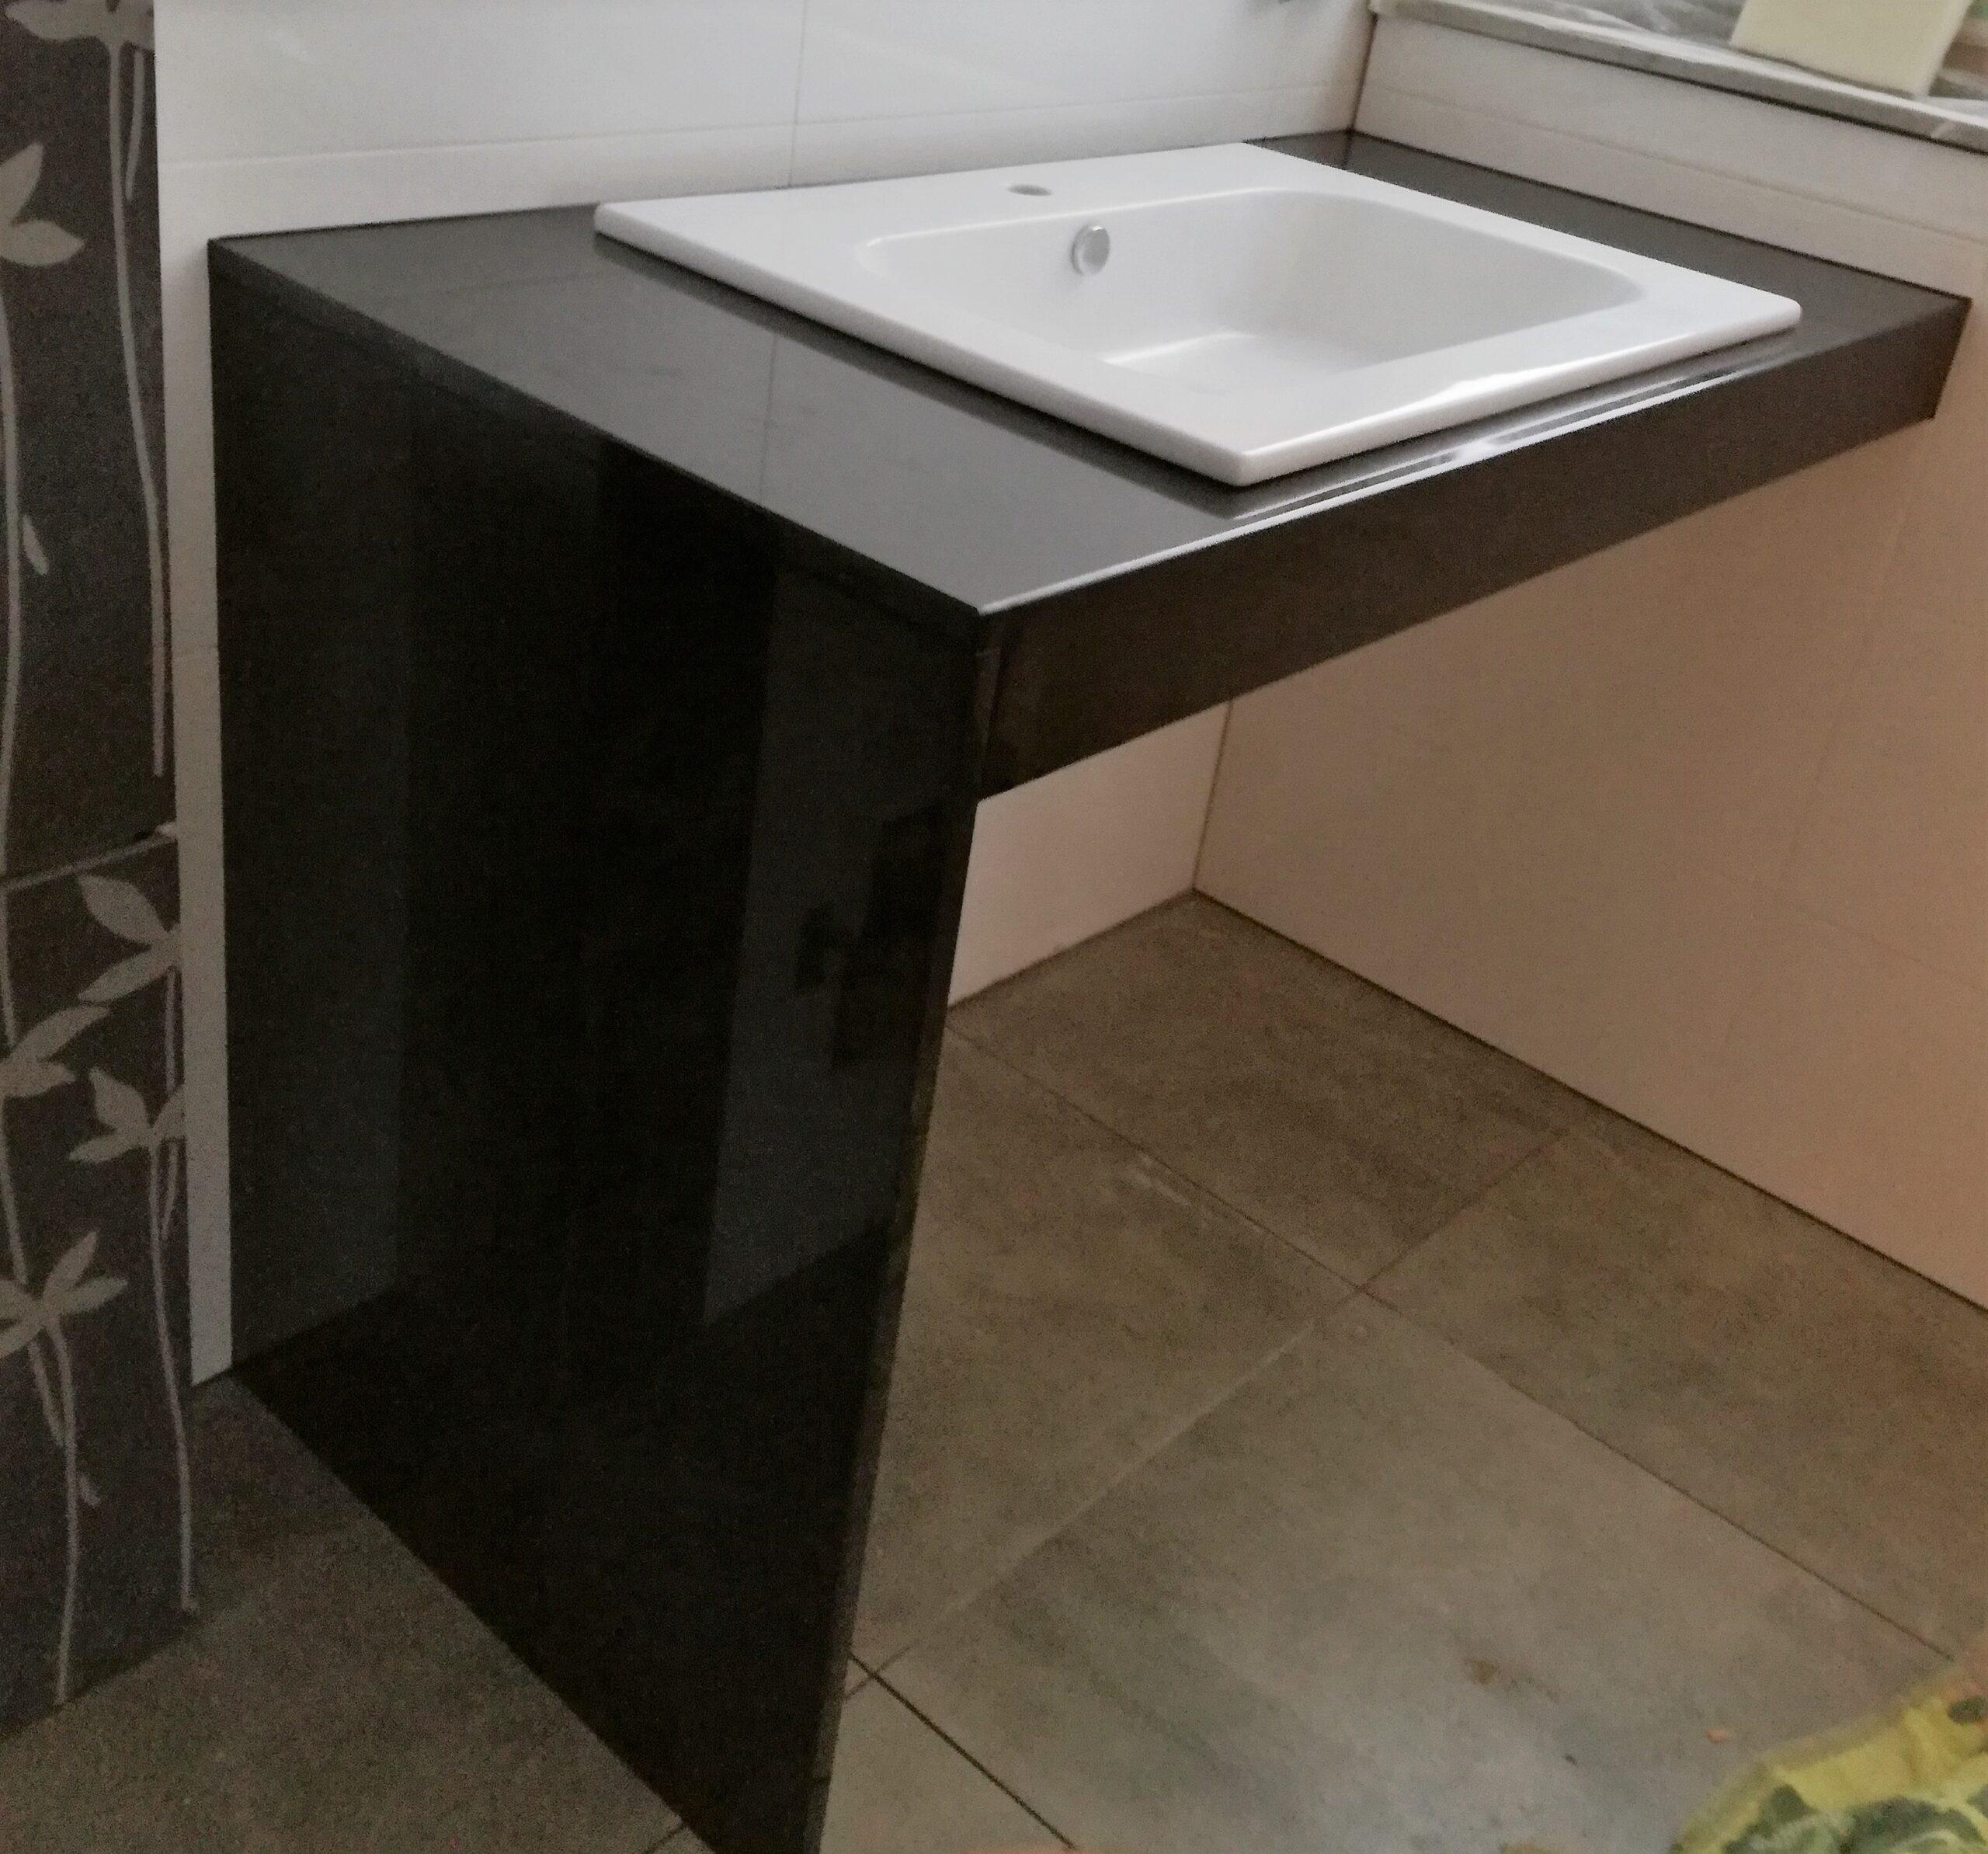 Full Size of Nero Assoluto Badezimmer Granitplatten Küche Arbeitsplatten Sideboard Mit Arbeitsplatte Wohnzimmer Granit Arbeitsplatte